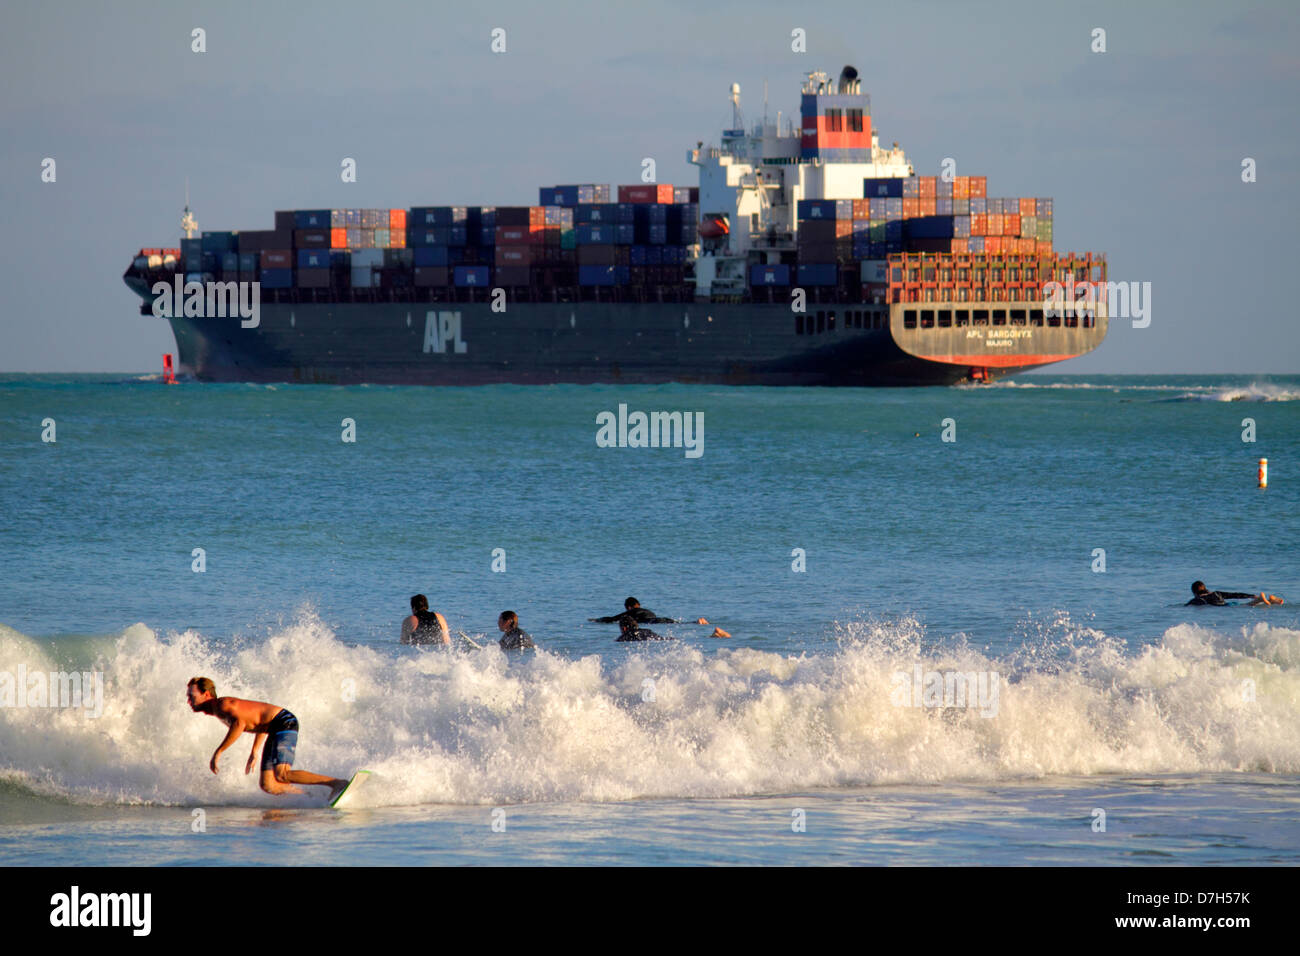 Miami Beach Florida Atlantic Ocean waves surf surfer surfboard riding man teen boy cargo container ship boat Stock Photo